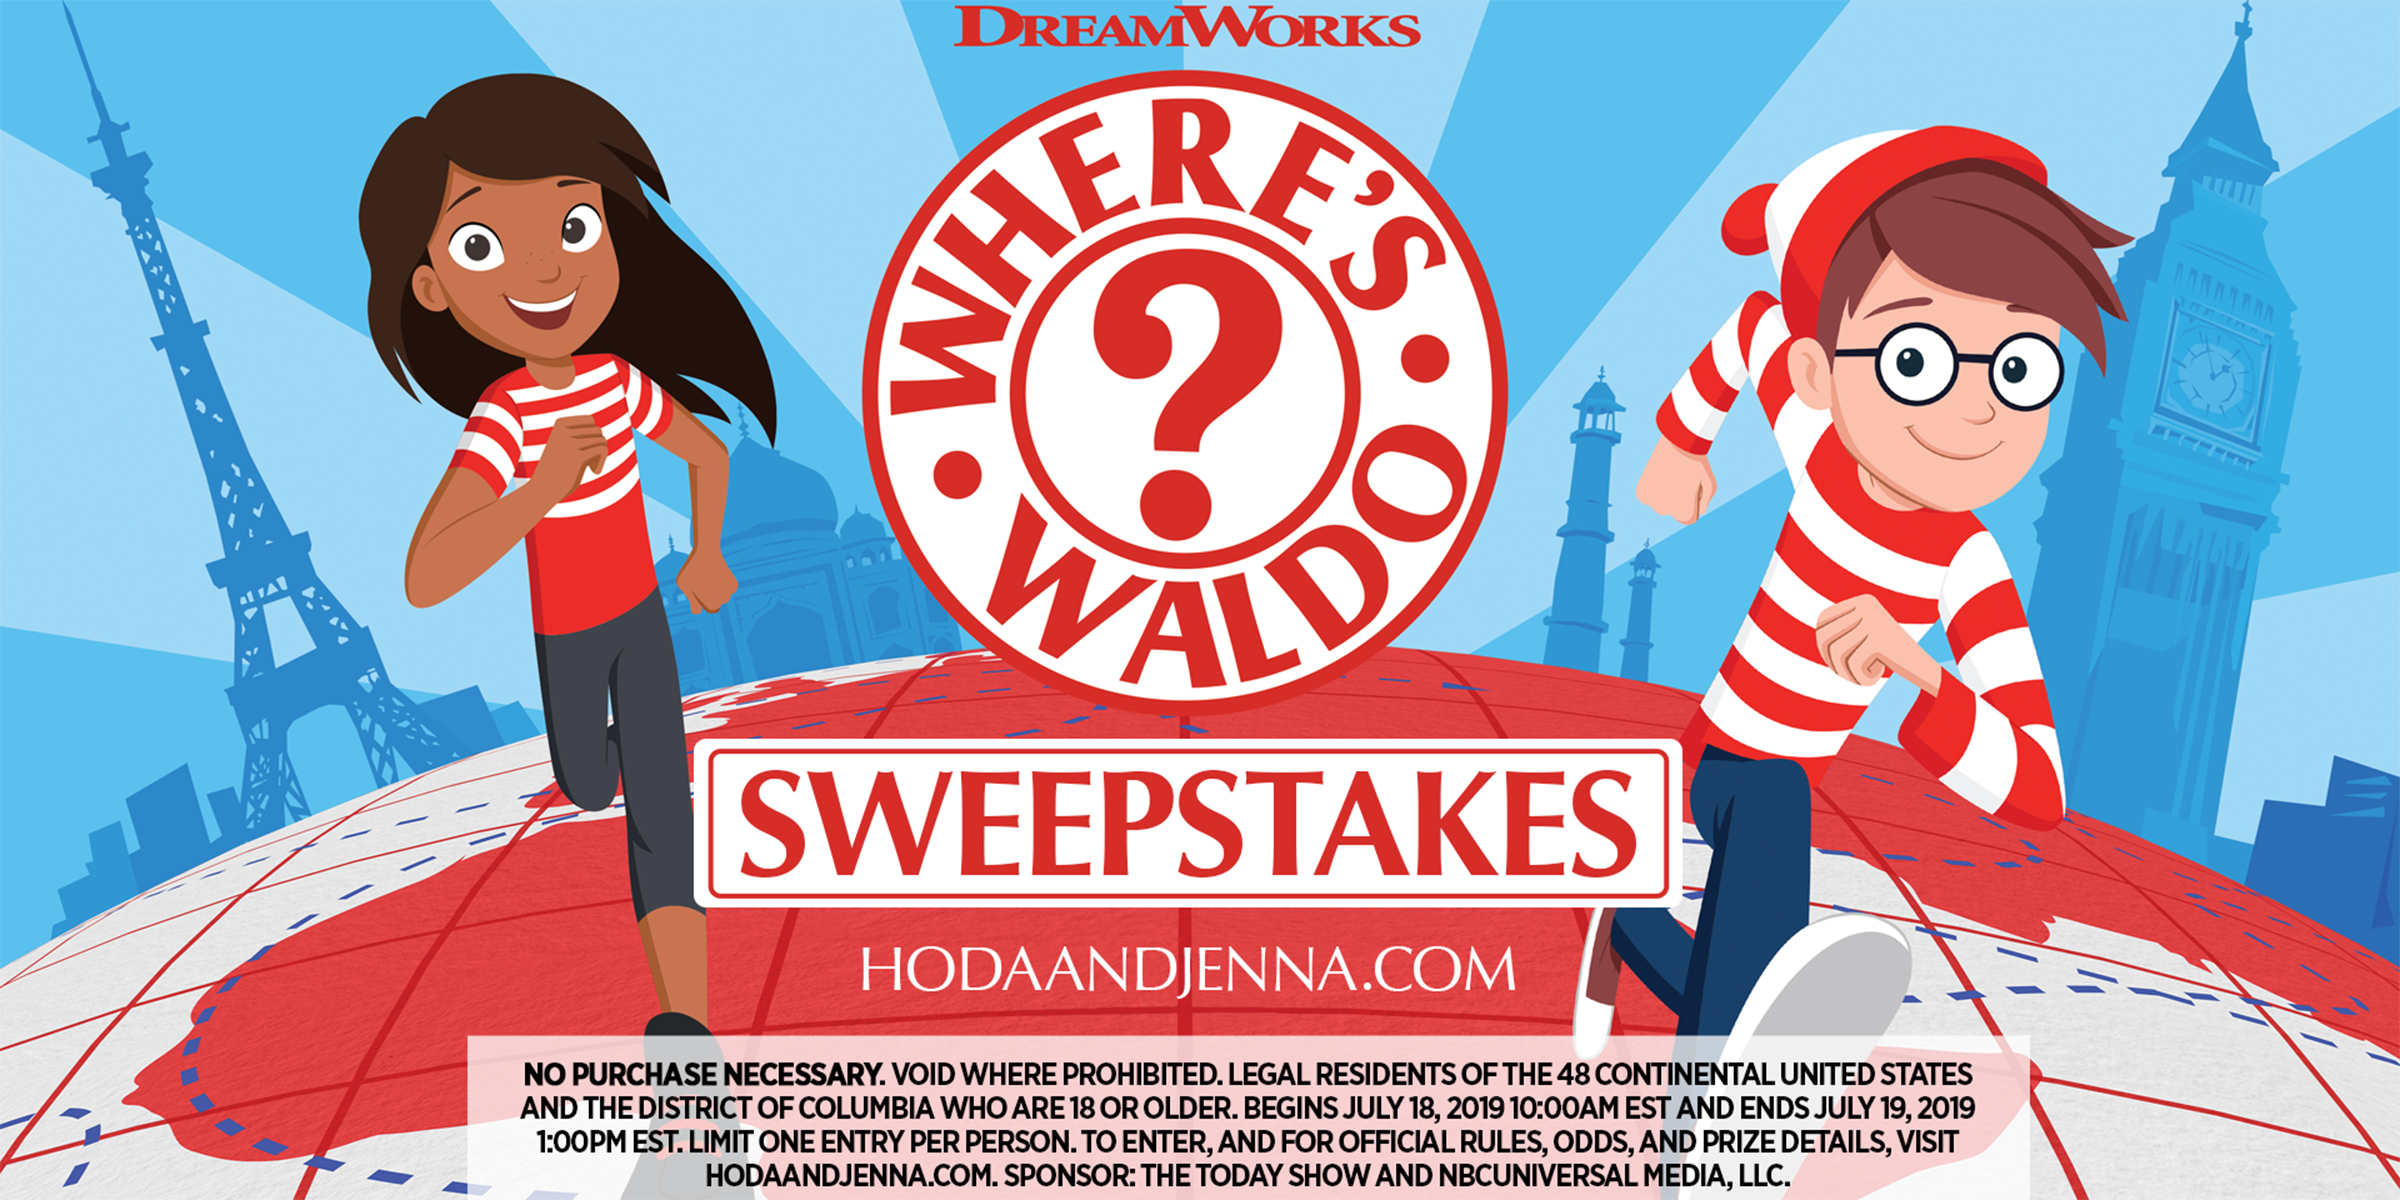 Where's Waldo sweepstakes: Enter to win a trip to Universal